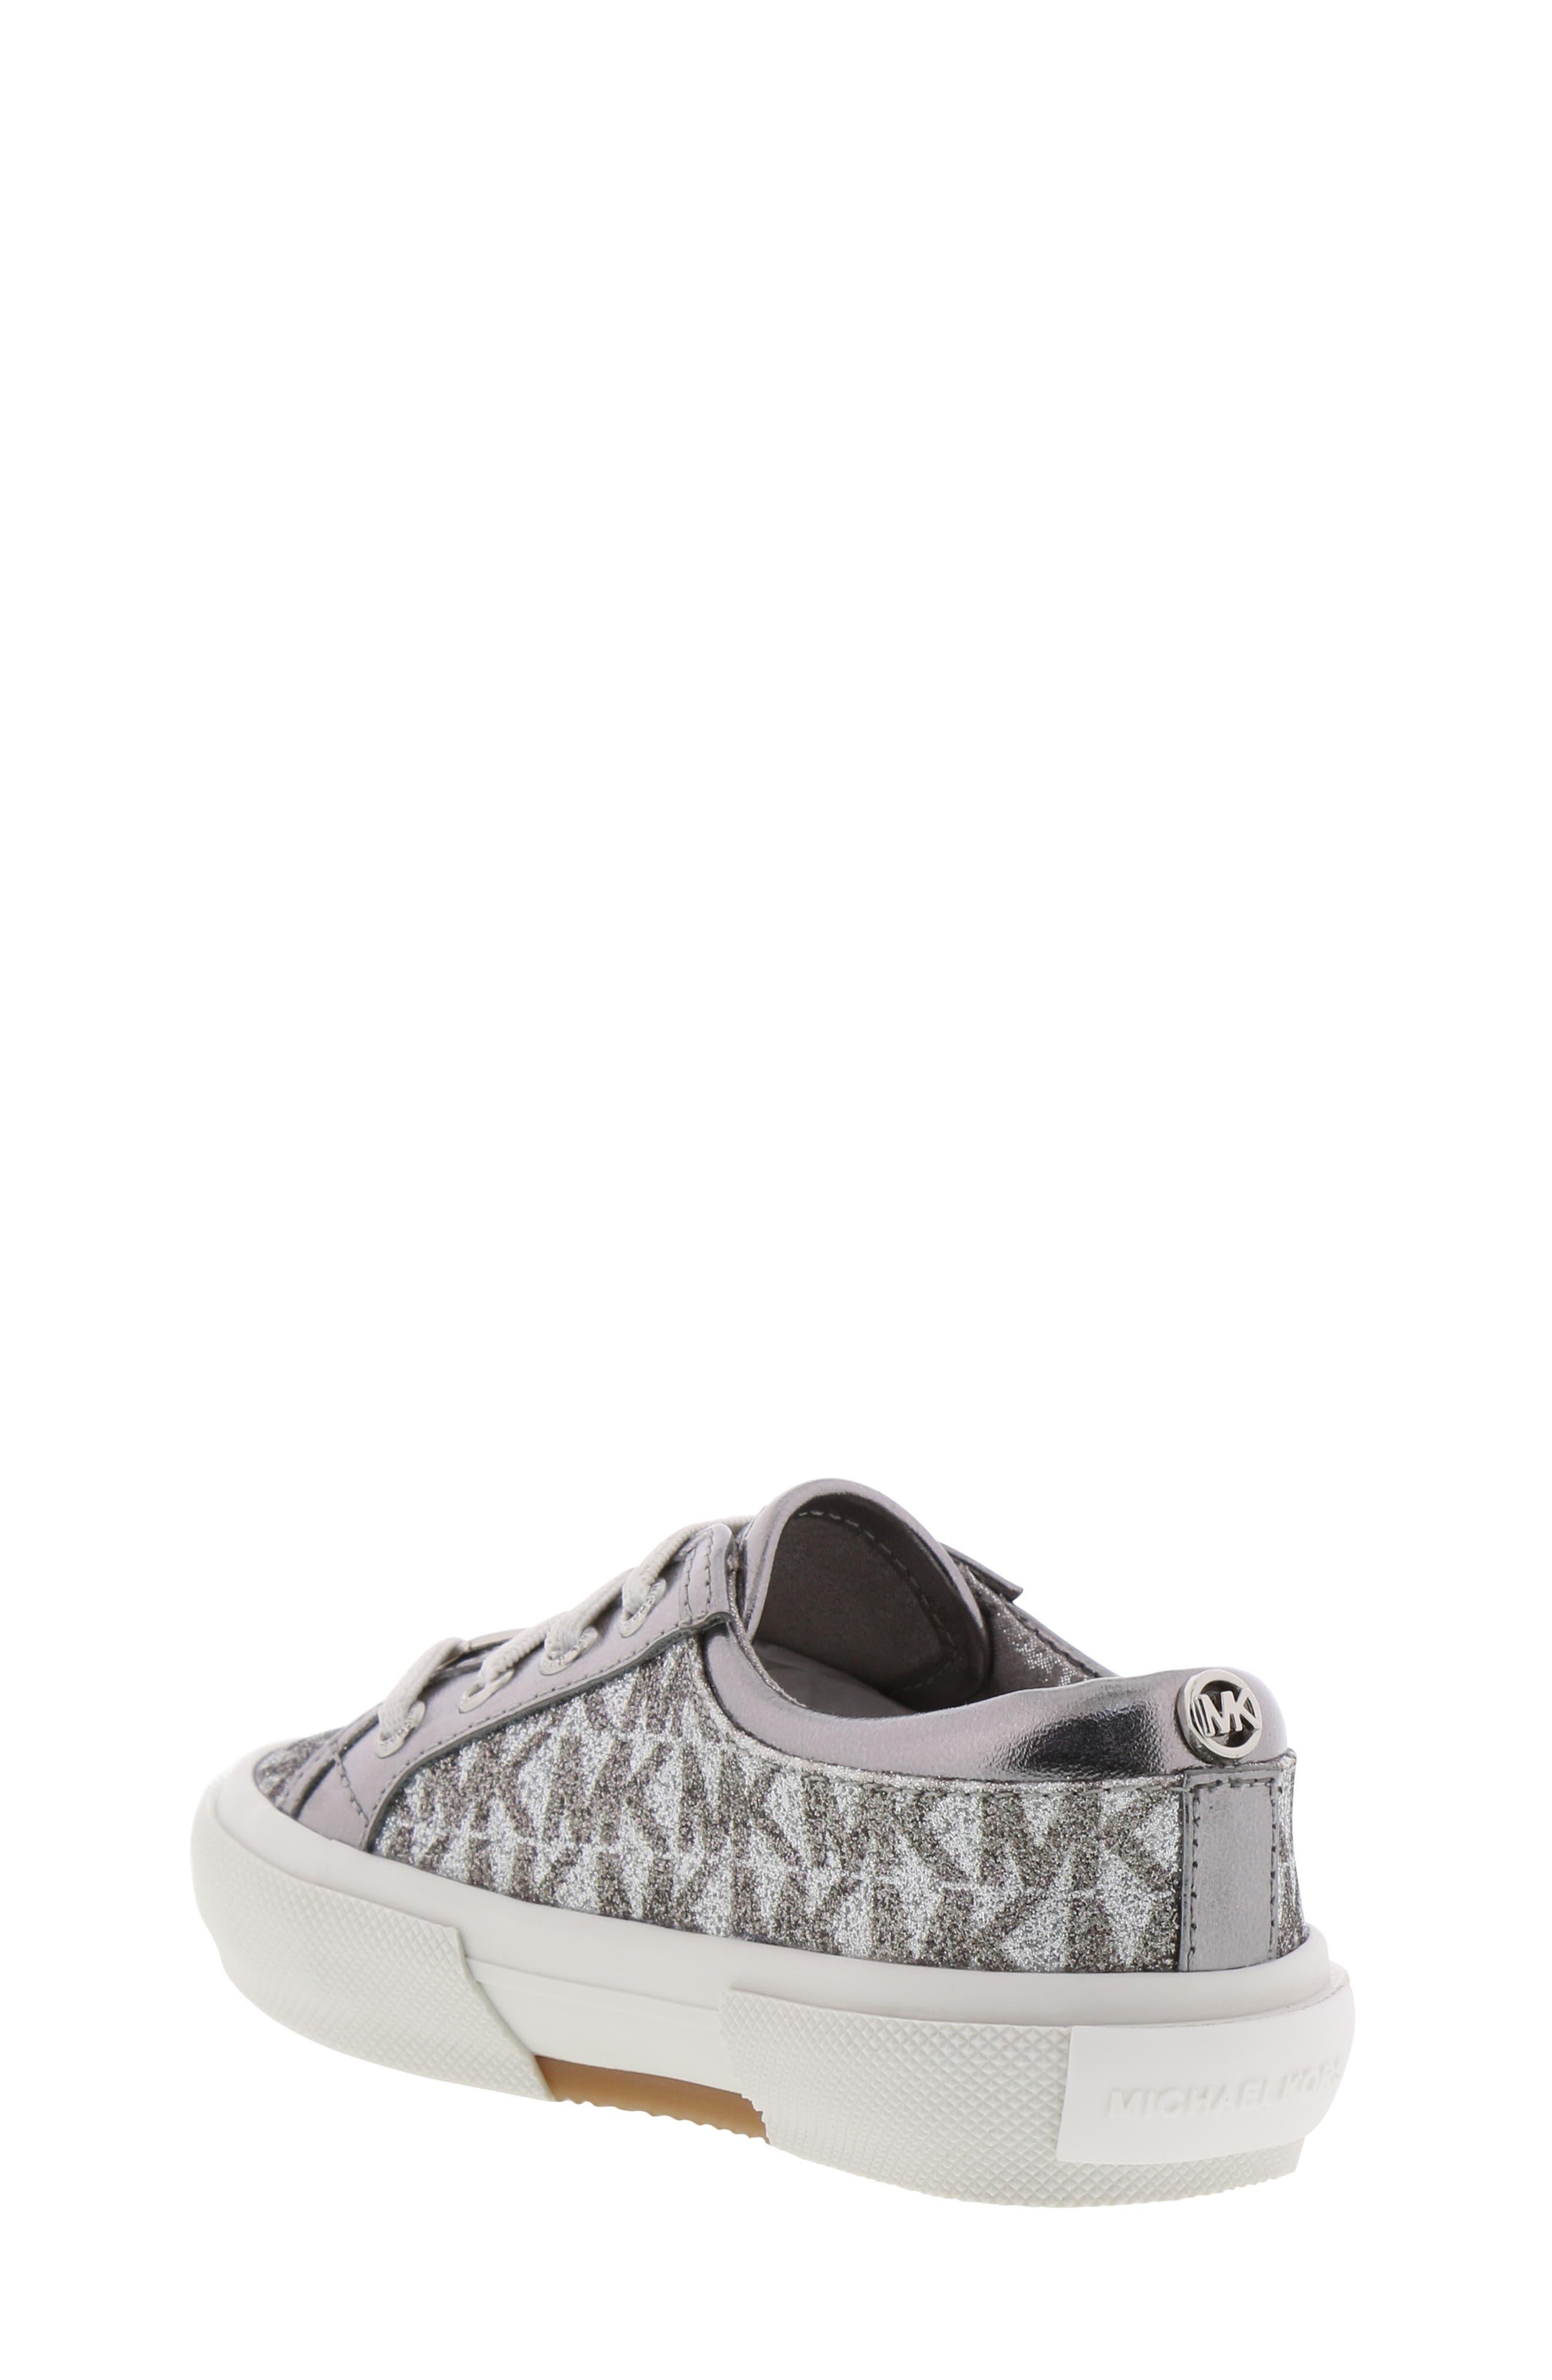 MICHAEL MICHAEL KORS,                             Ima Tinsel Sneaker,                             Alternate thumbnail 2, color,                             GUNMETAL